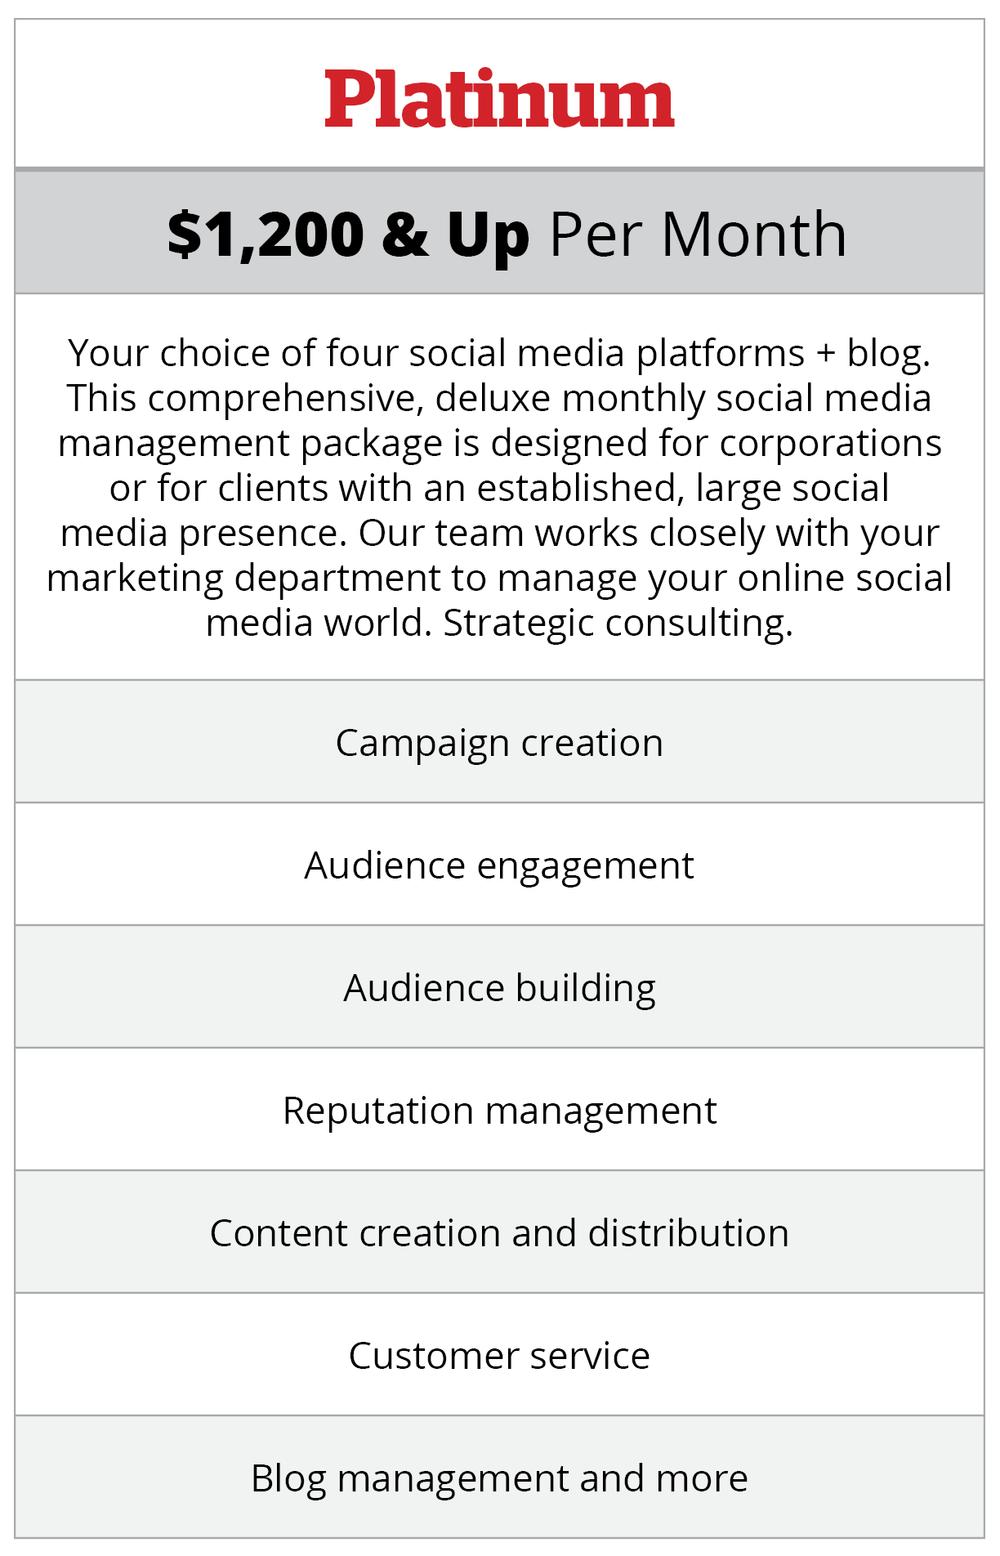 BEV- Platium Social Management